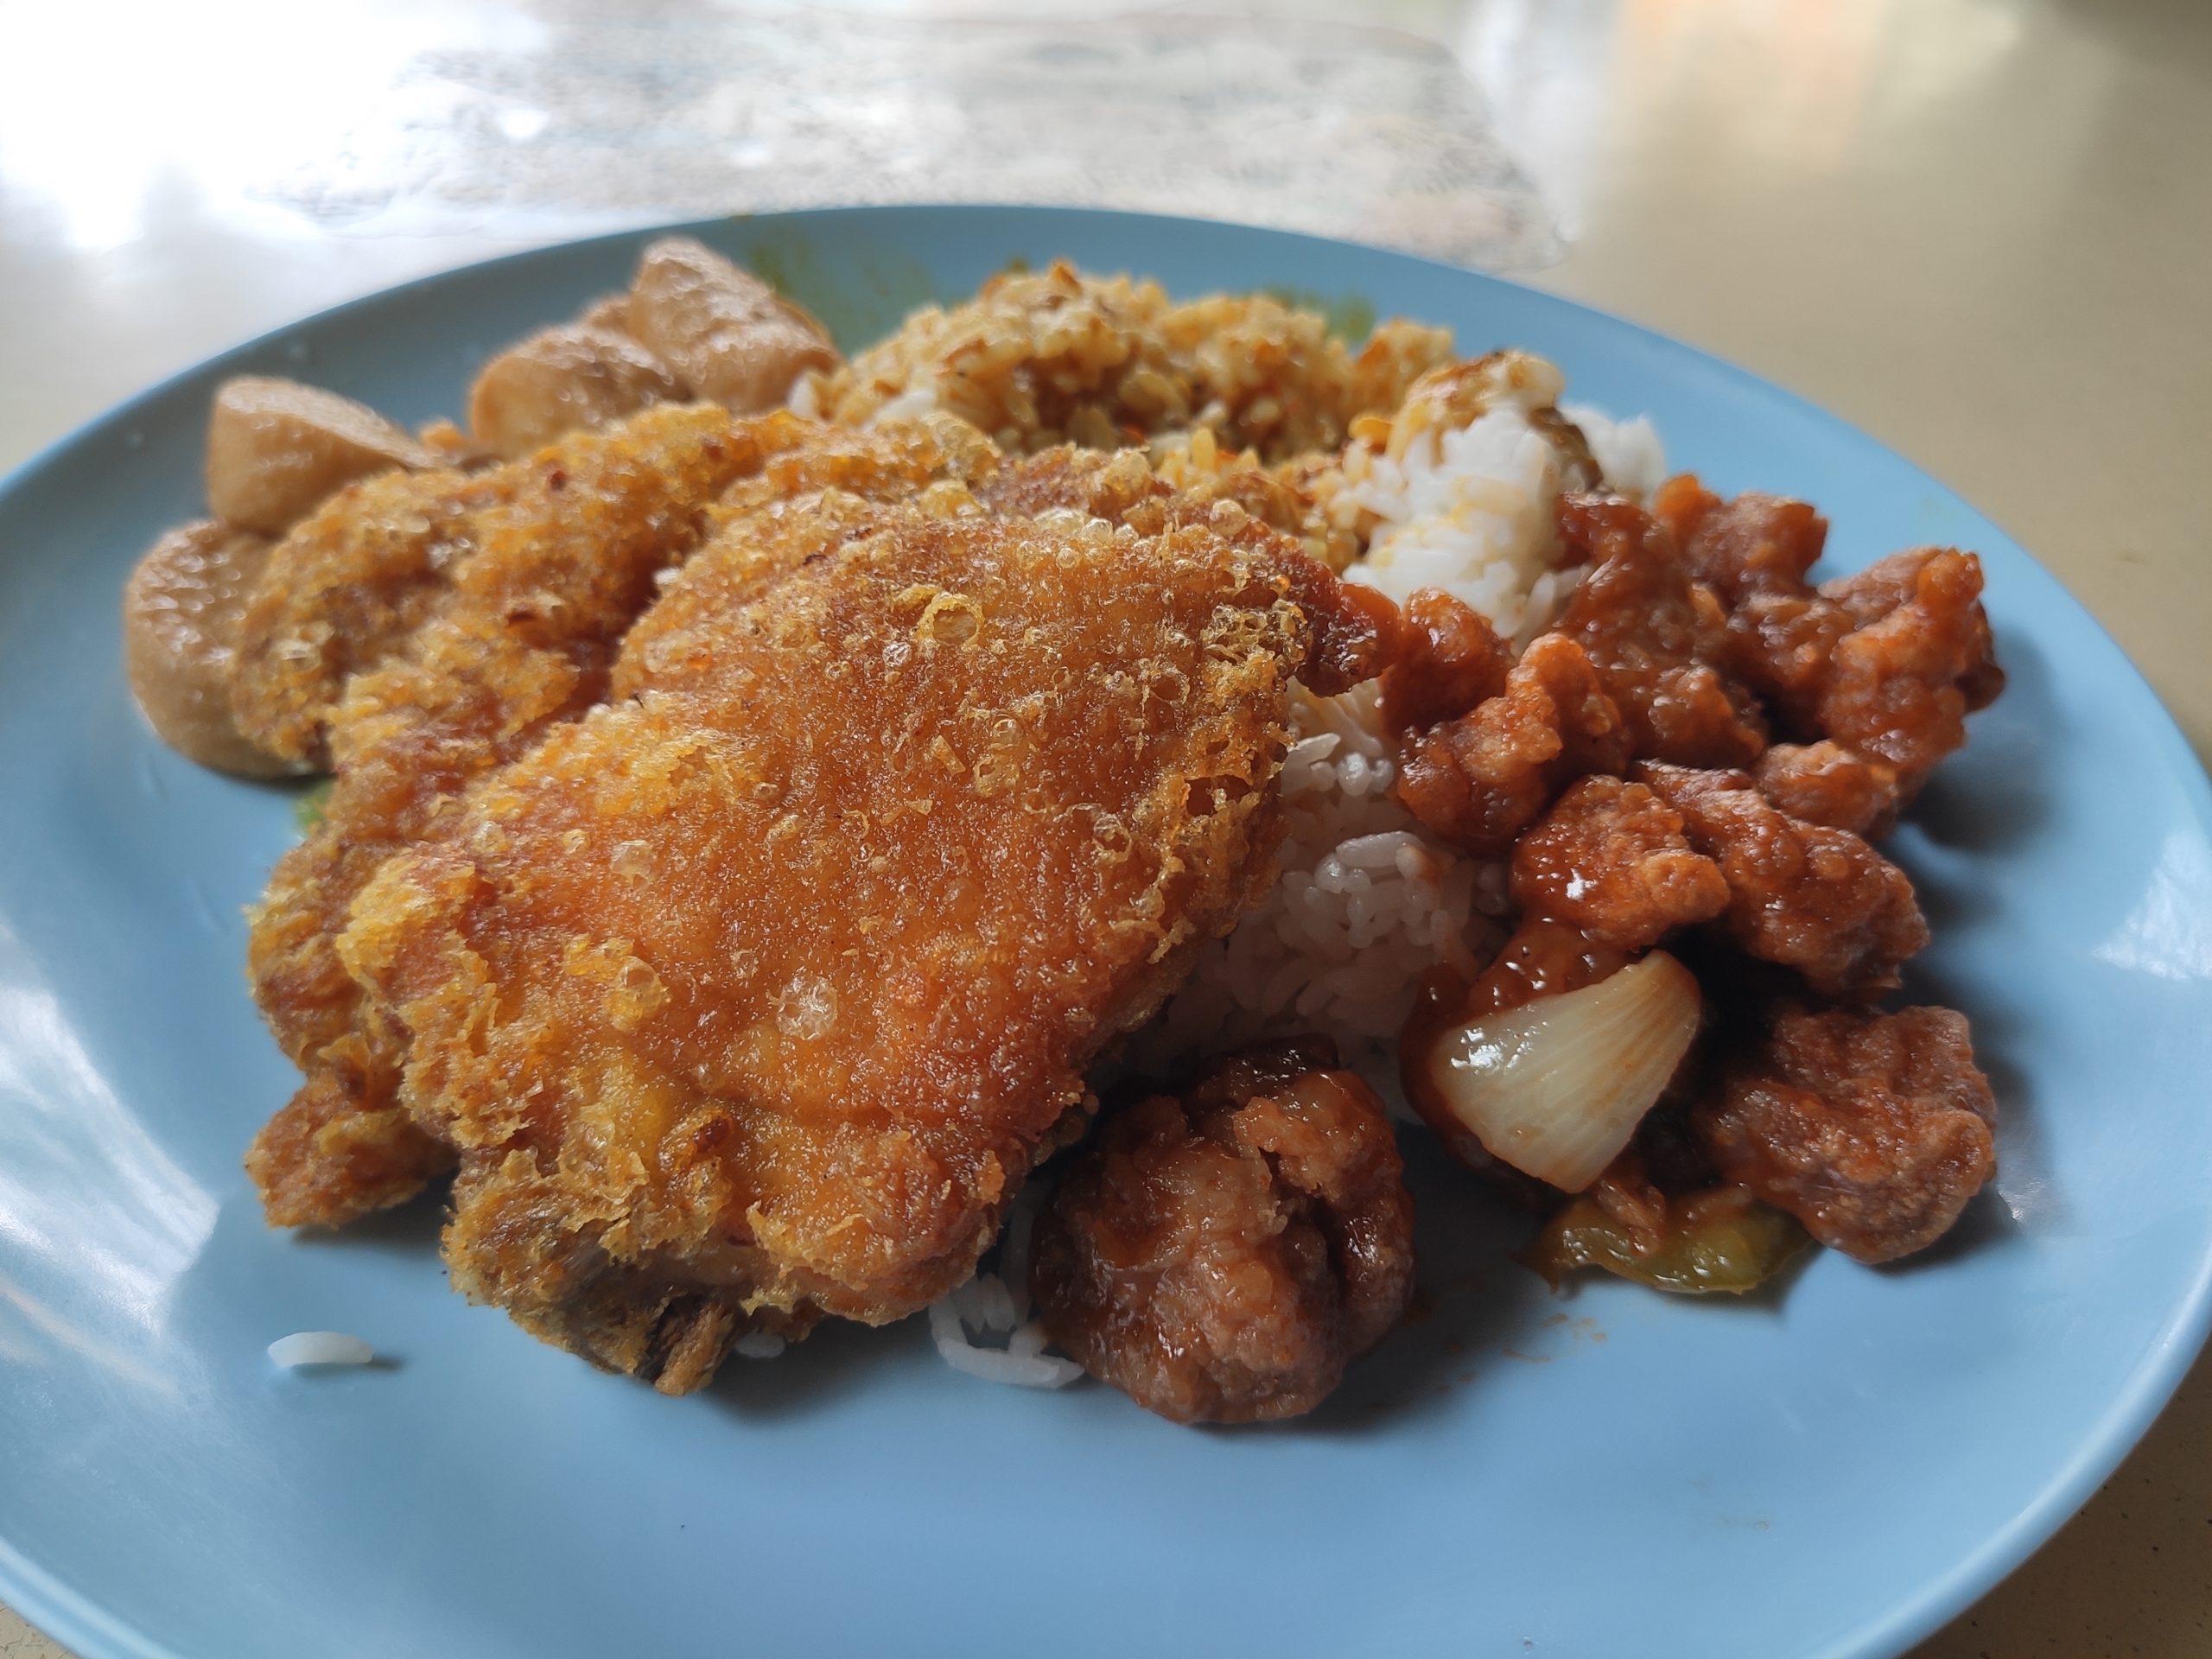 Fushan Mixed Vege Rice: Chicken Cutlet, Sweet Sour Pork, Egg Tofu